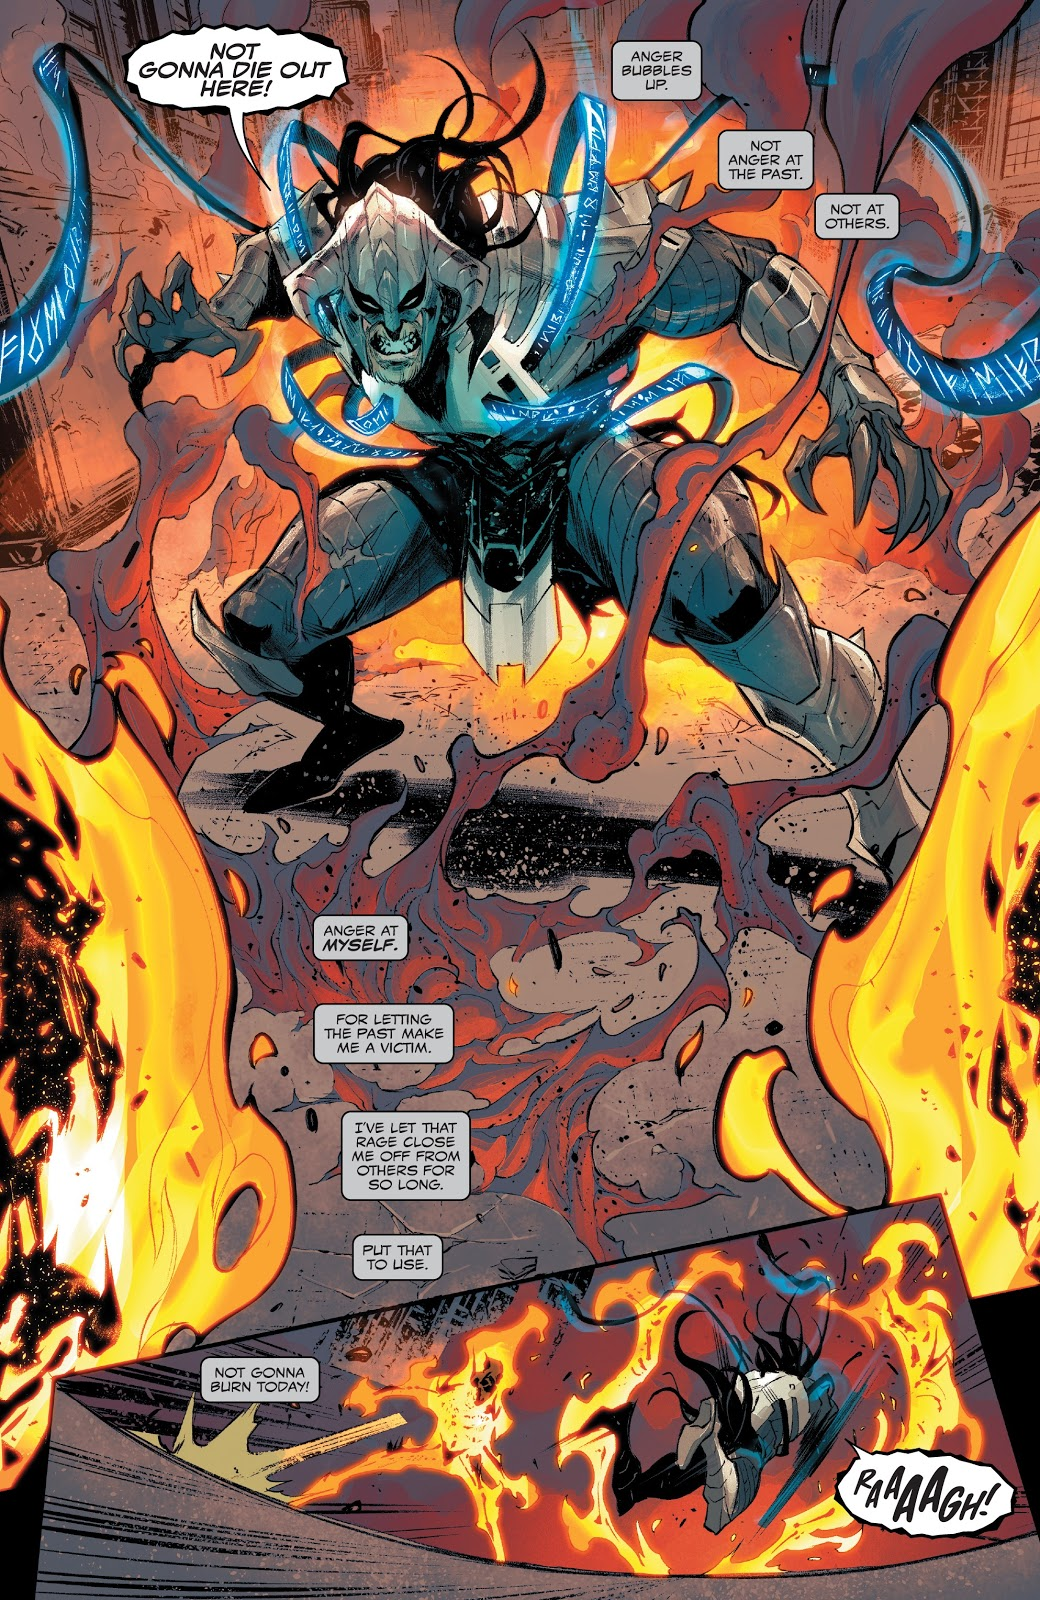 Venom Vol. 4 #15